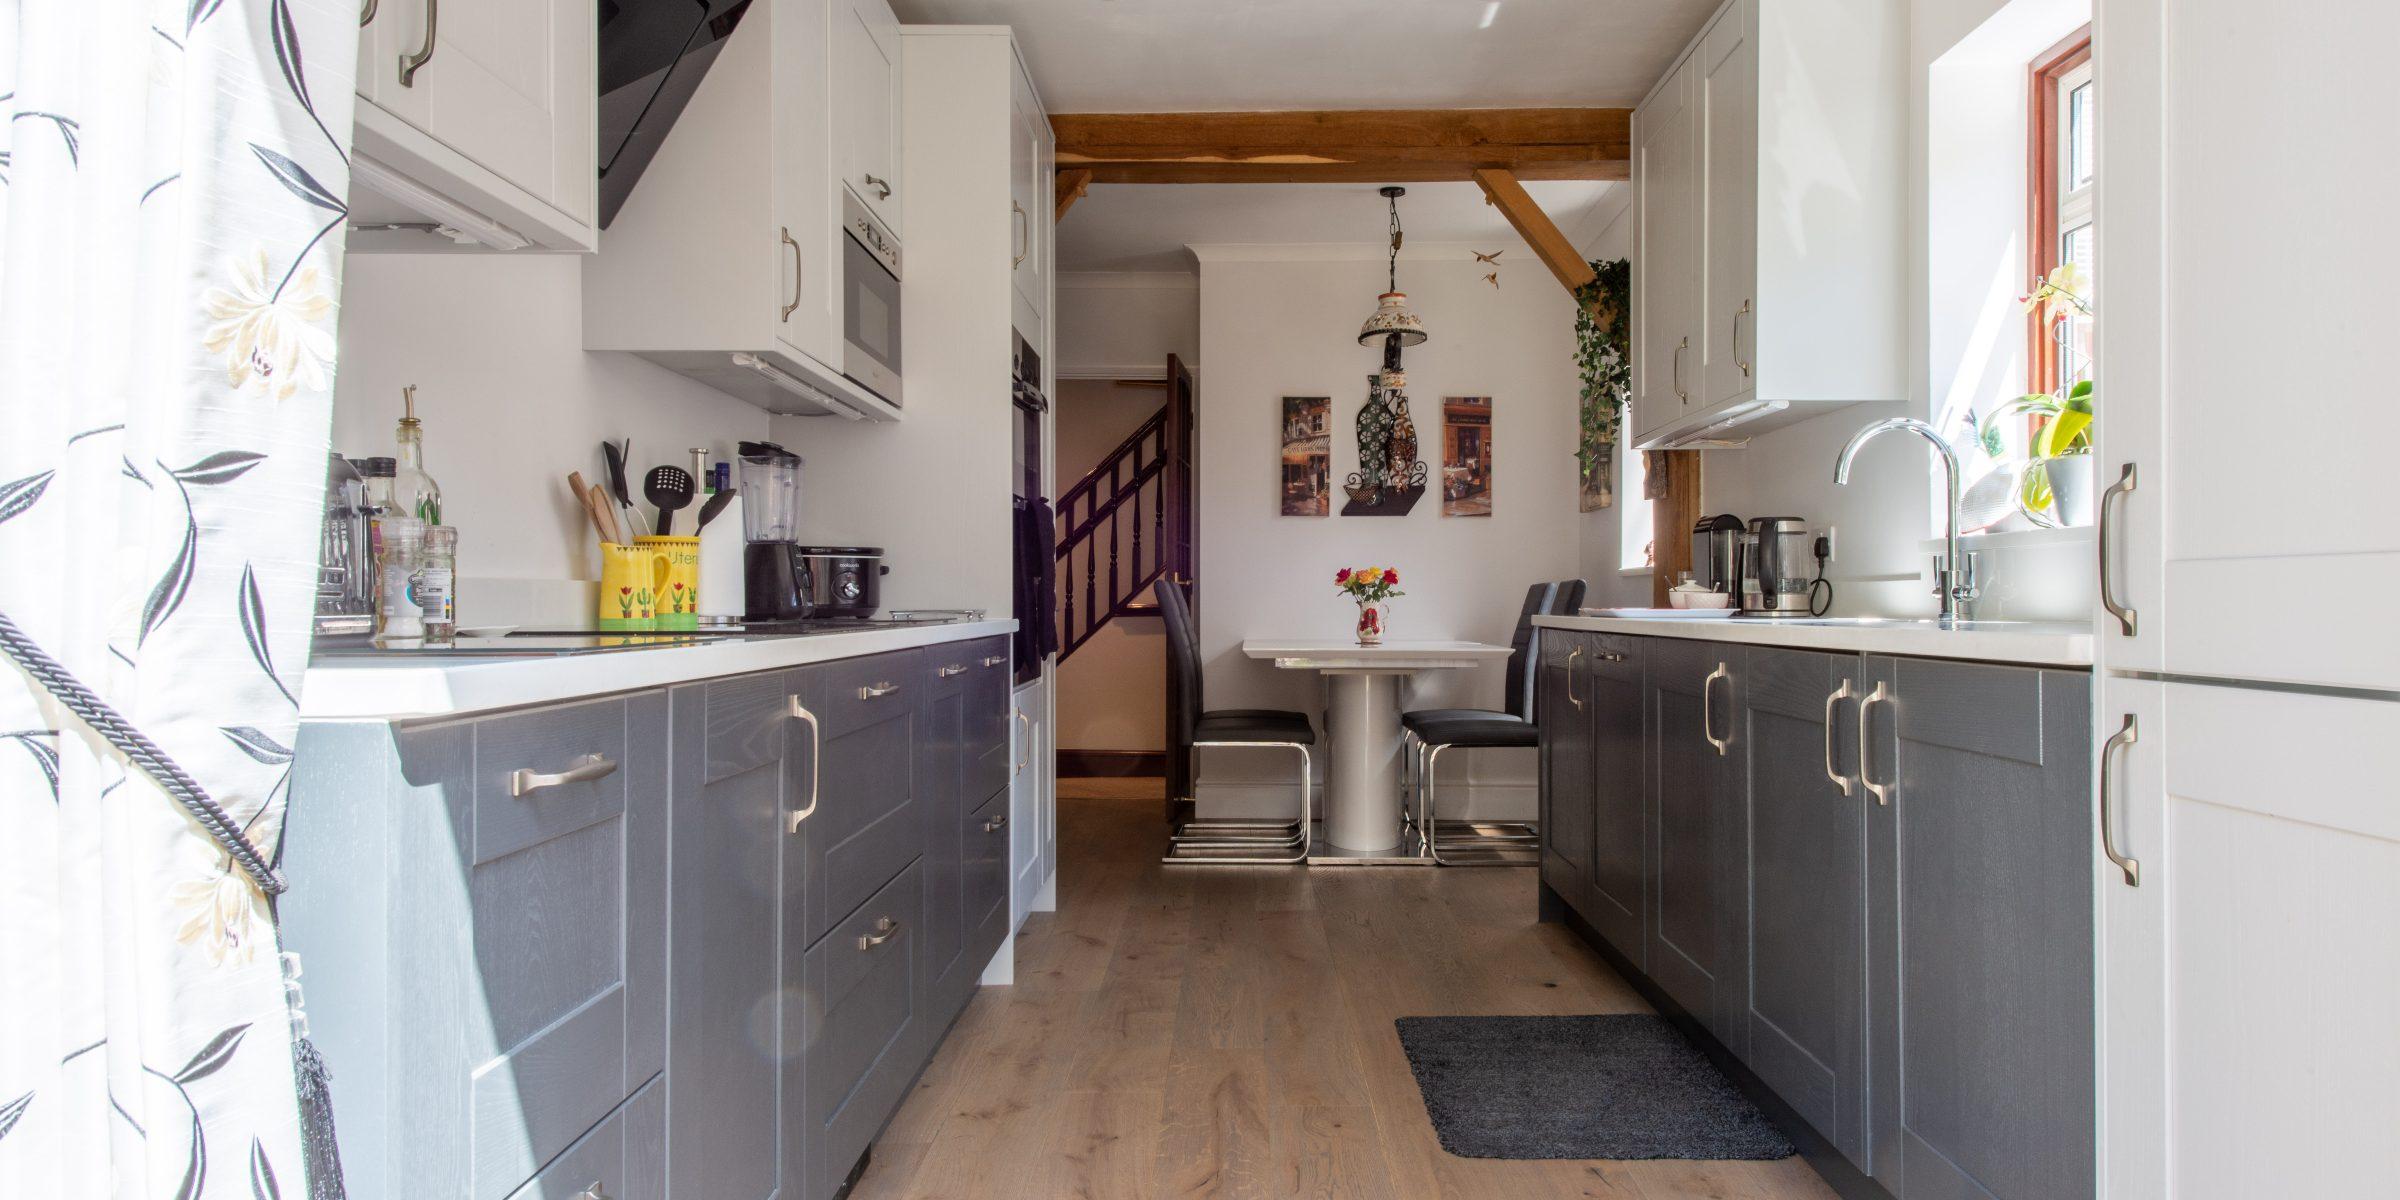 Deco frozen umber knaphill kitchen 1